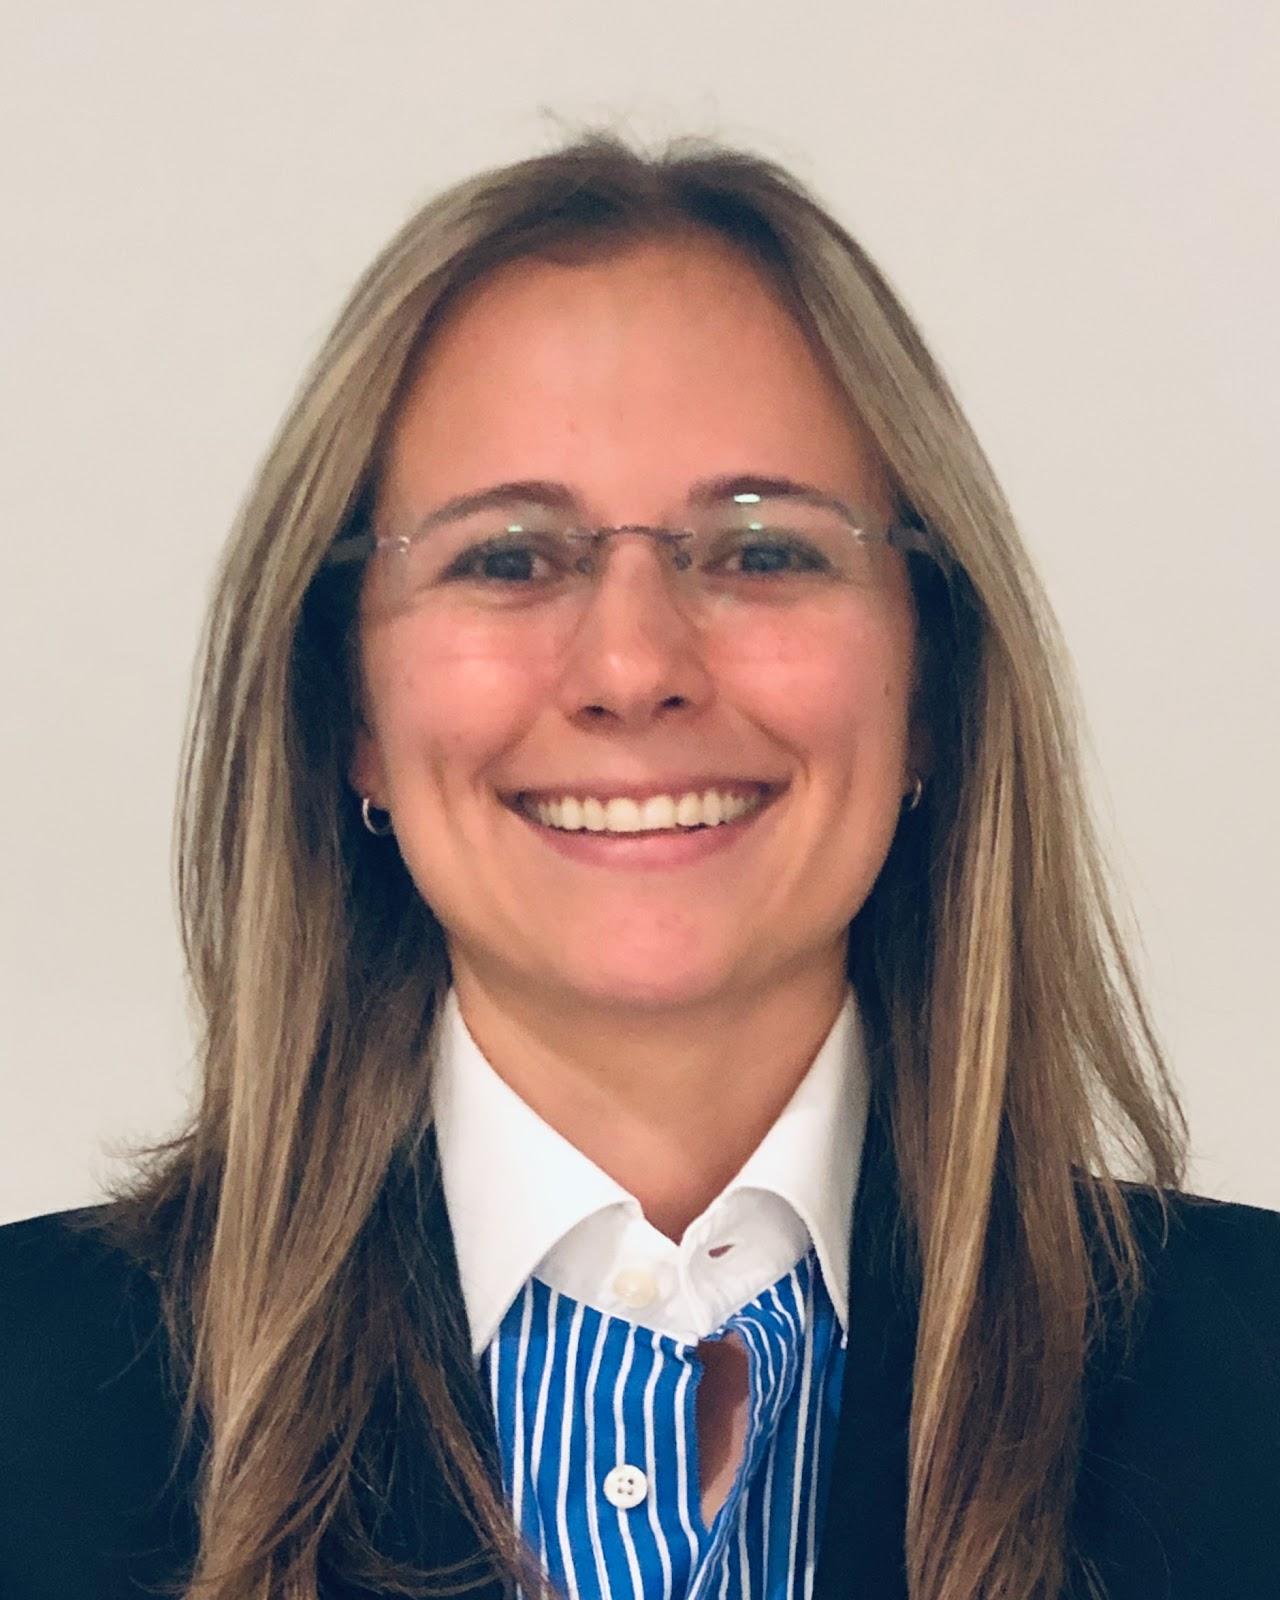 Dr. Monica Llado-Farrulla